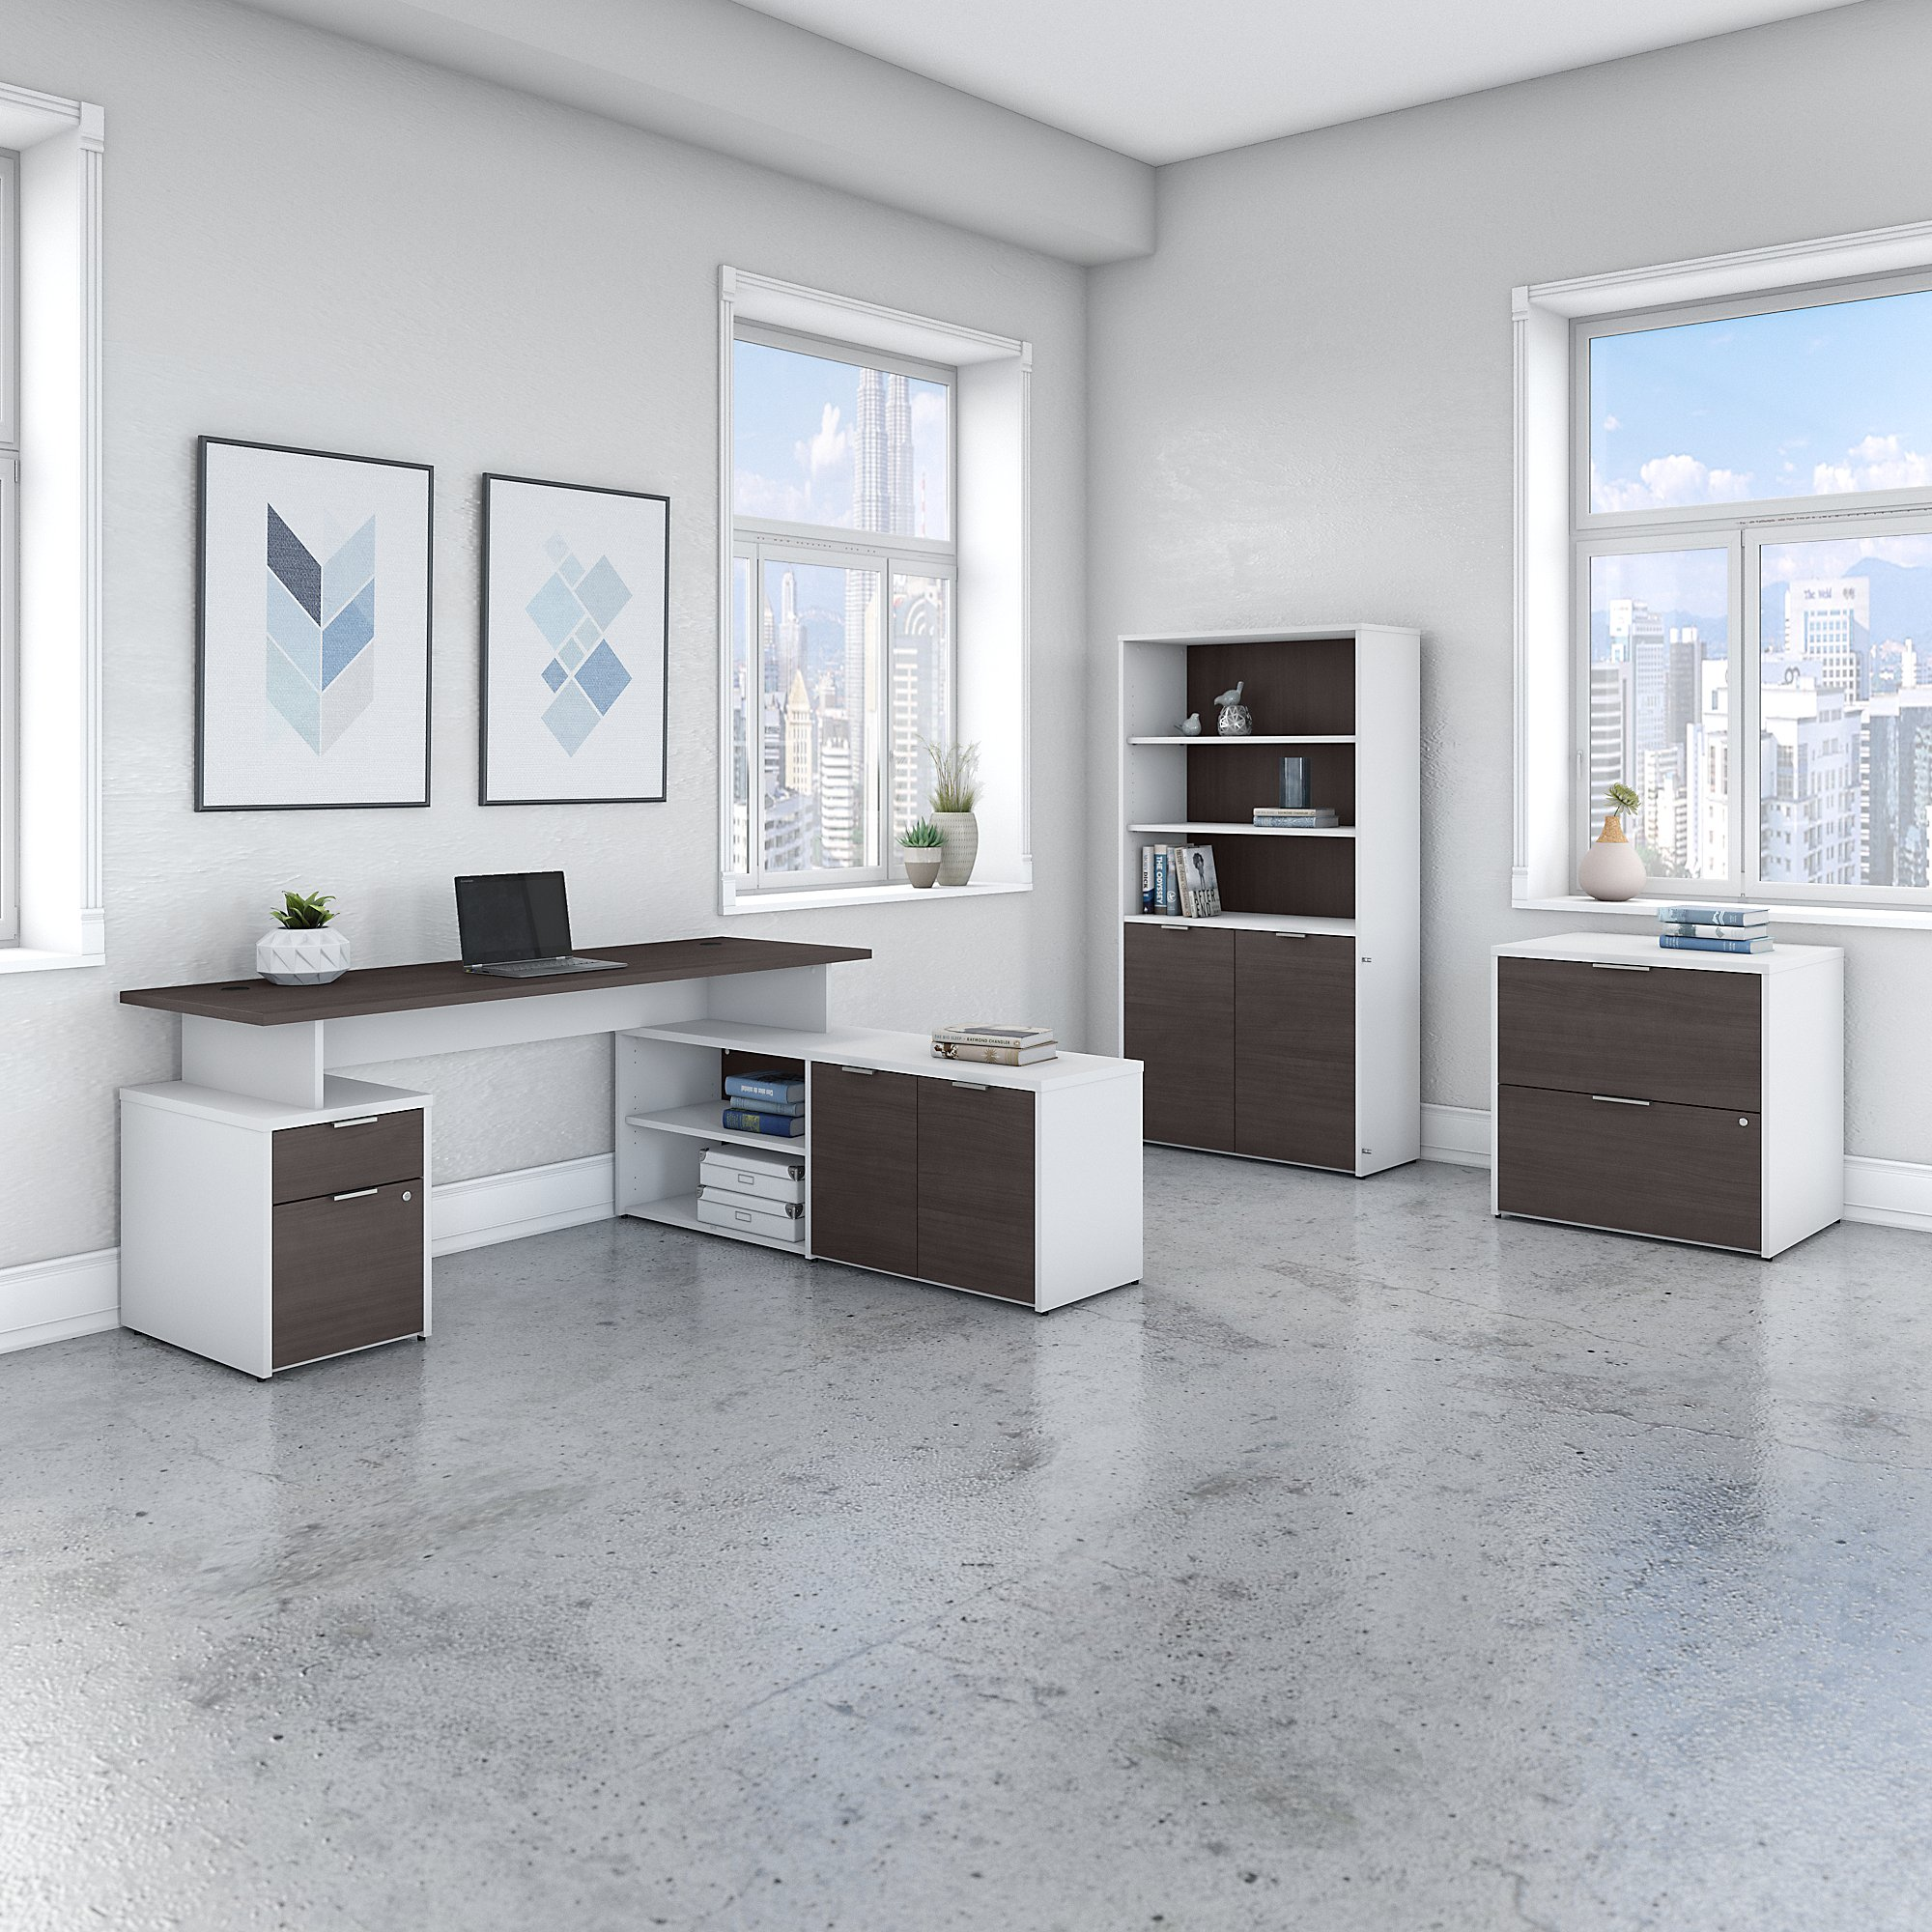 model jtn011 jamestown gray and white l desk set